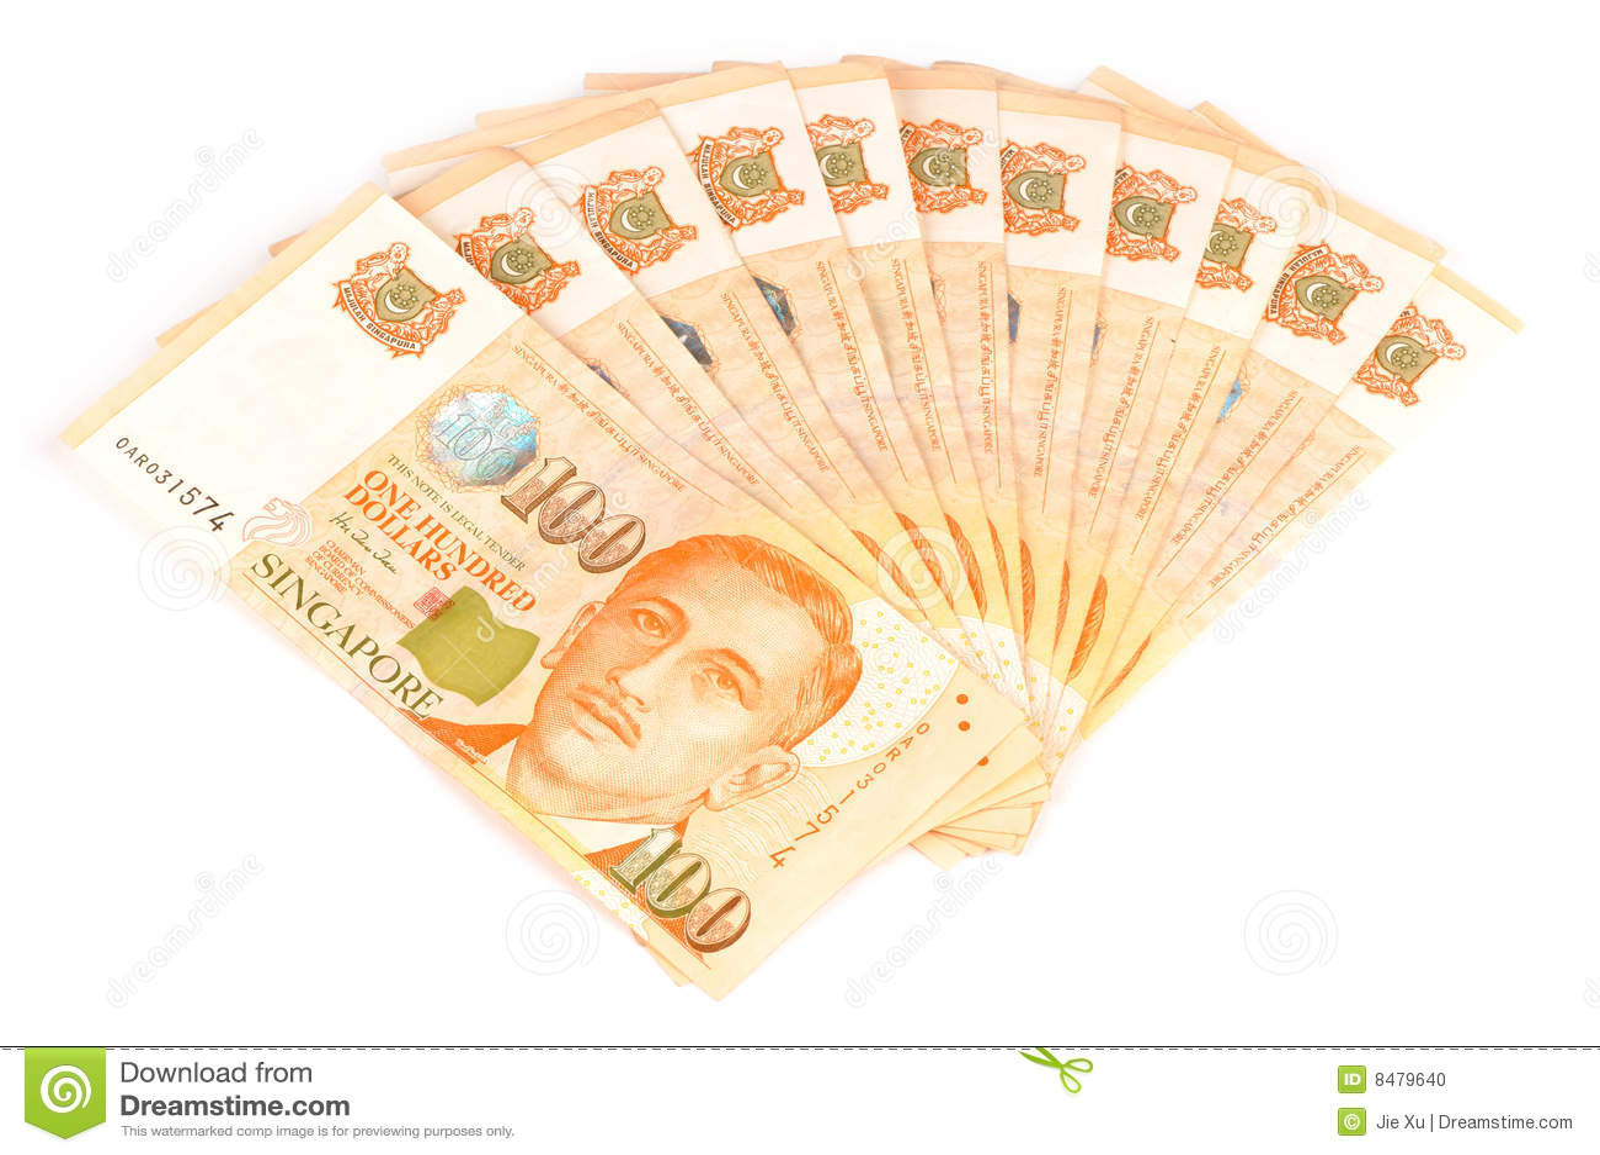 Singapore dollar notes stock photos 187 images fan shaped singapore dollar notes isolated on white background stock photo biocorpaavc